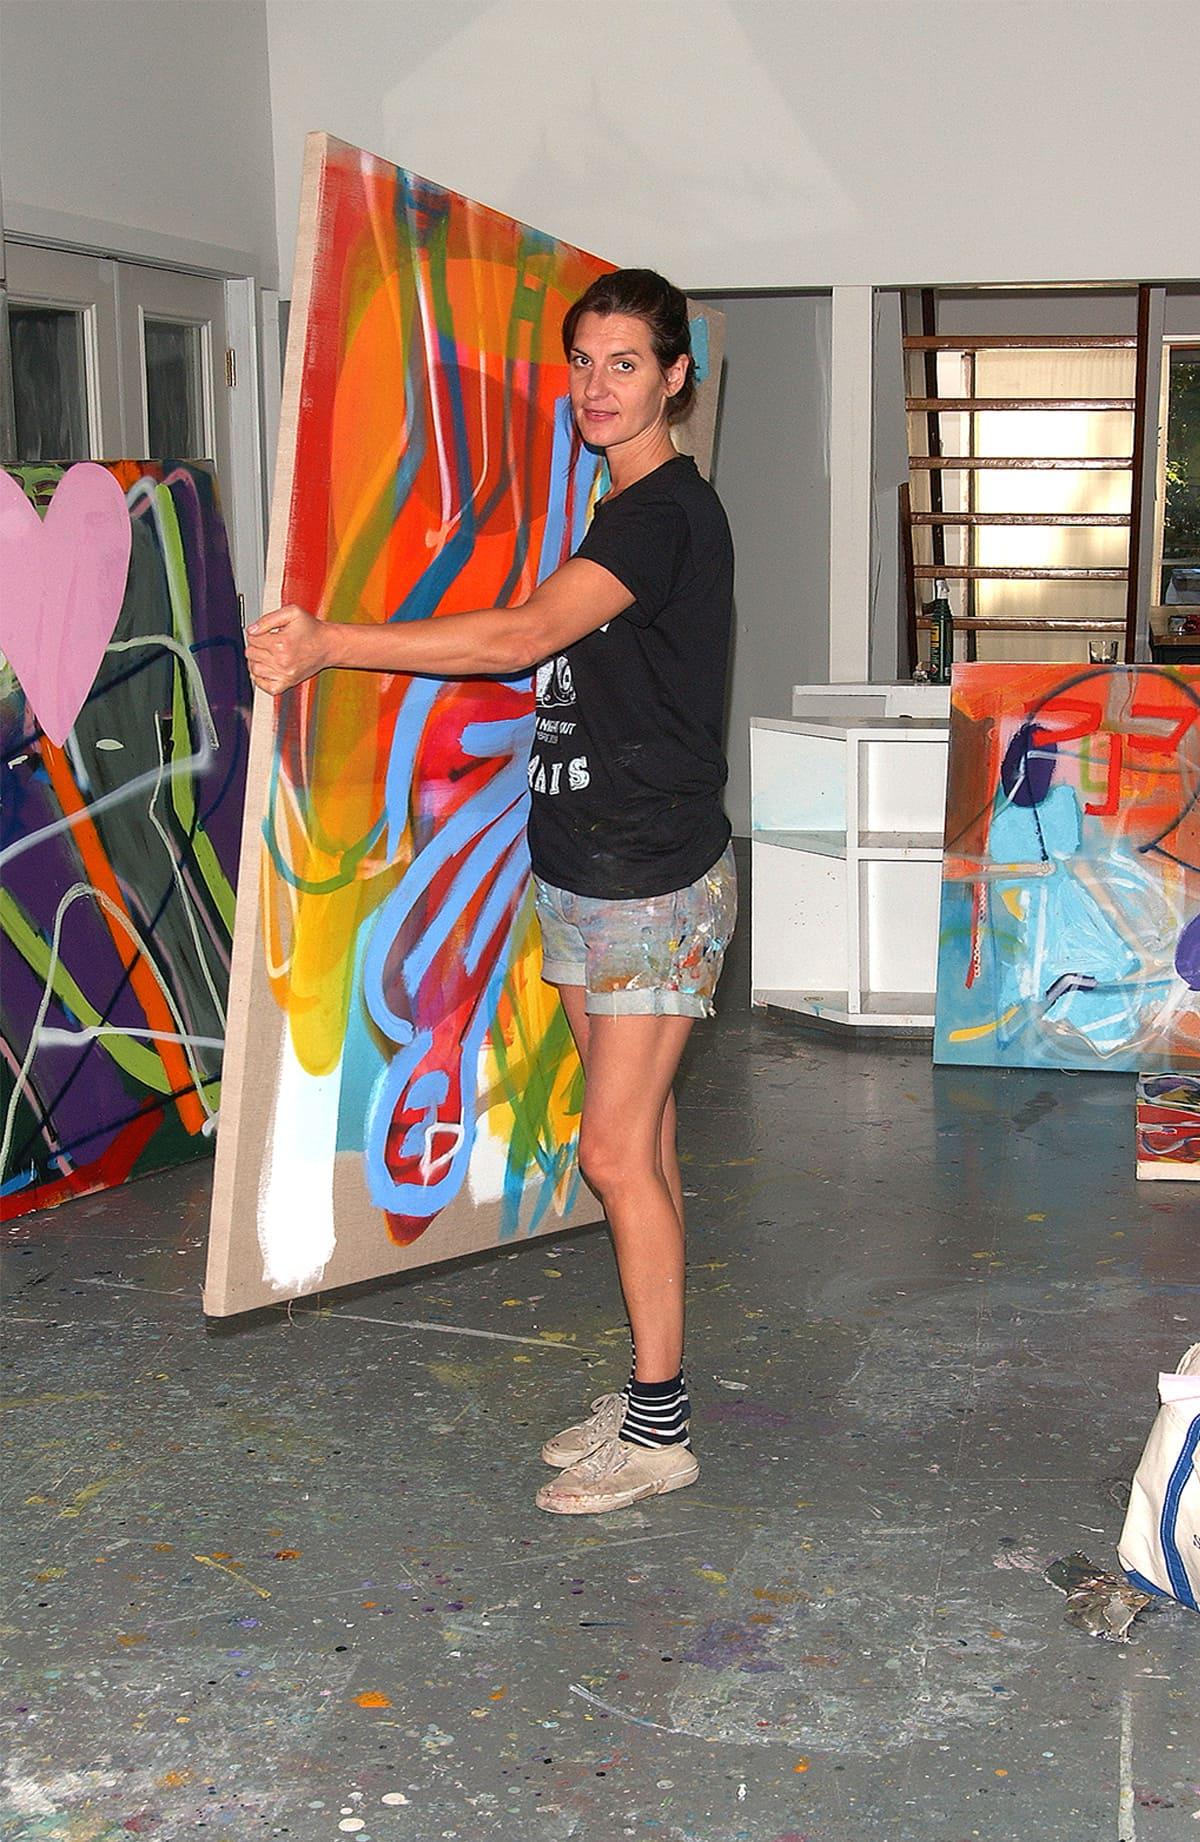 Artist Sadie Laska during her artist in residency at the former home and art studio of Elaine de Kooning in East Hampton, NY.